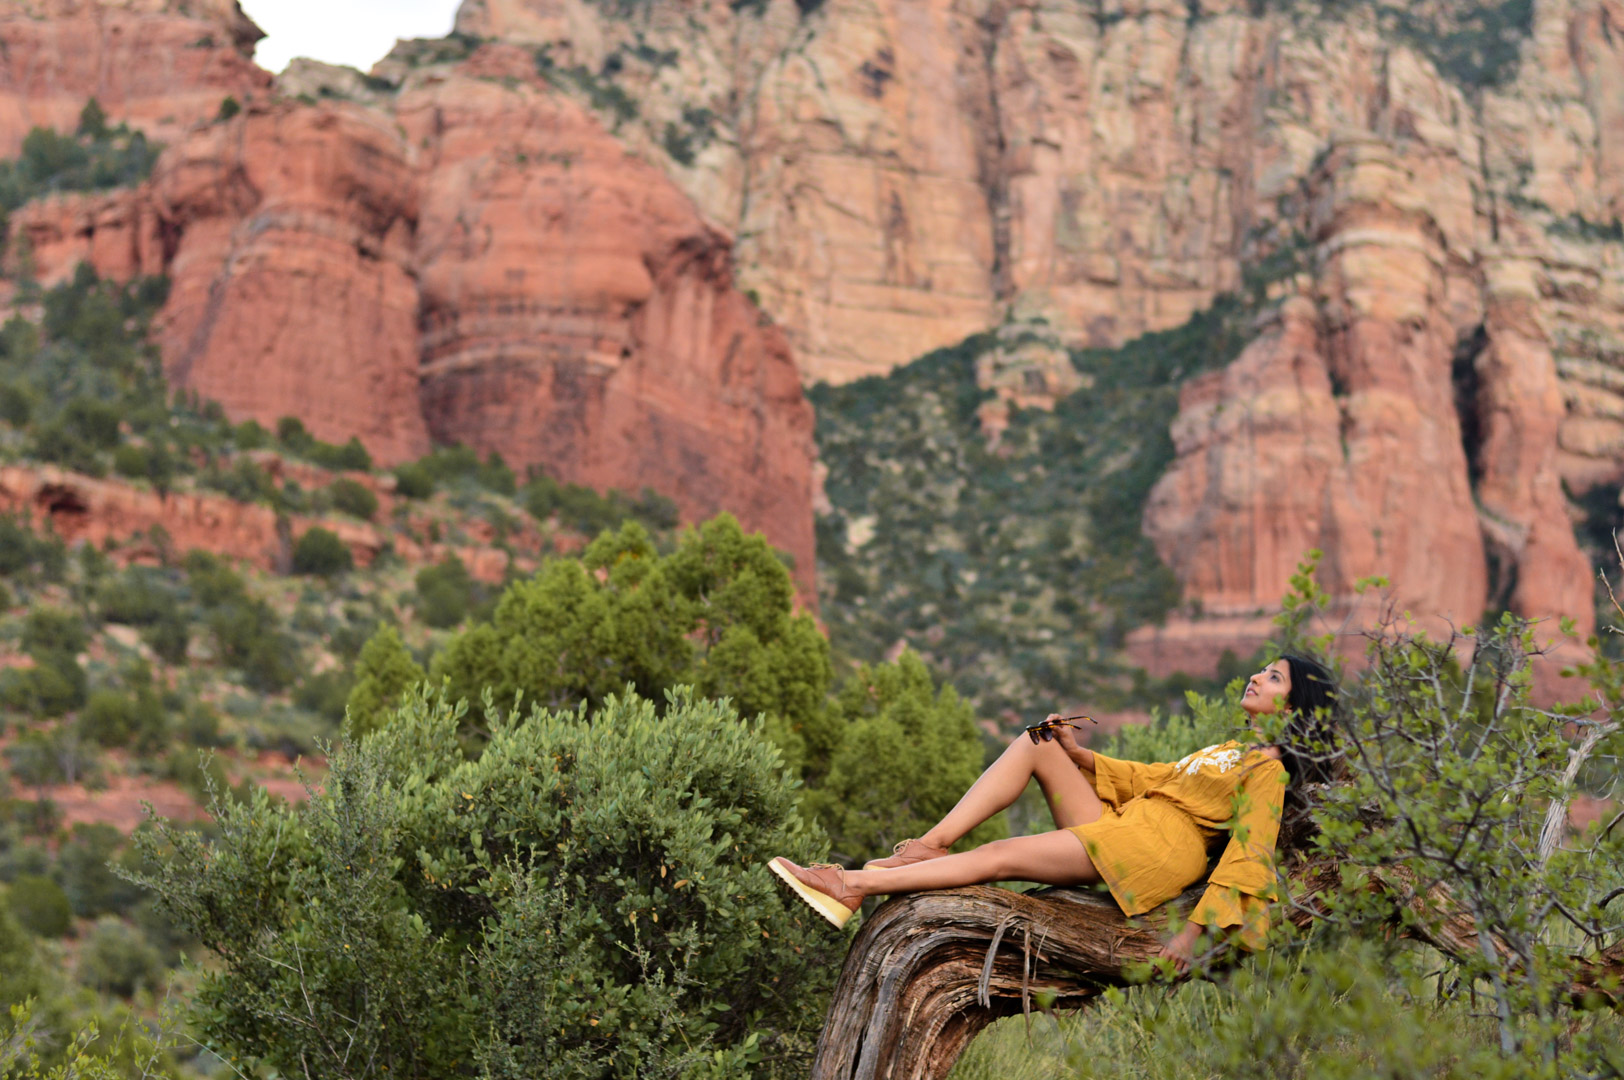 sedona-arizona-mustard-yellow-marigold-romper-travel-blogger-outfit 12